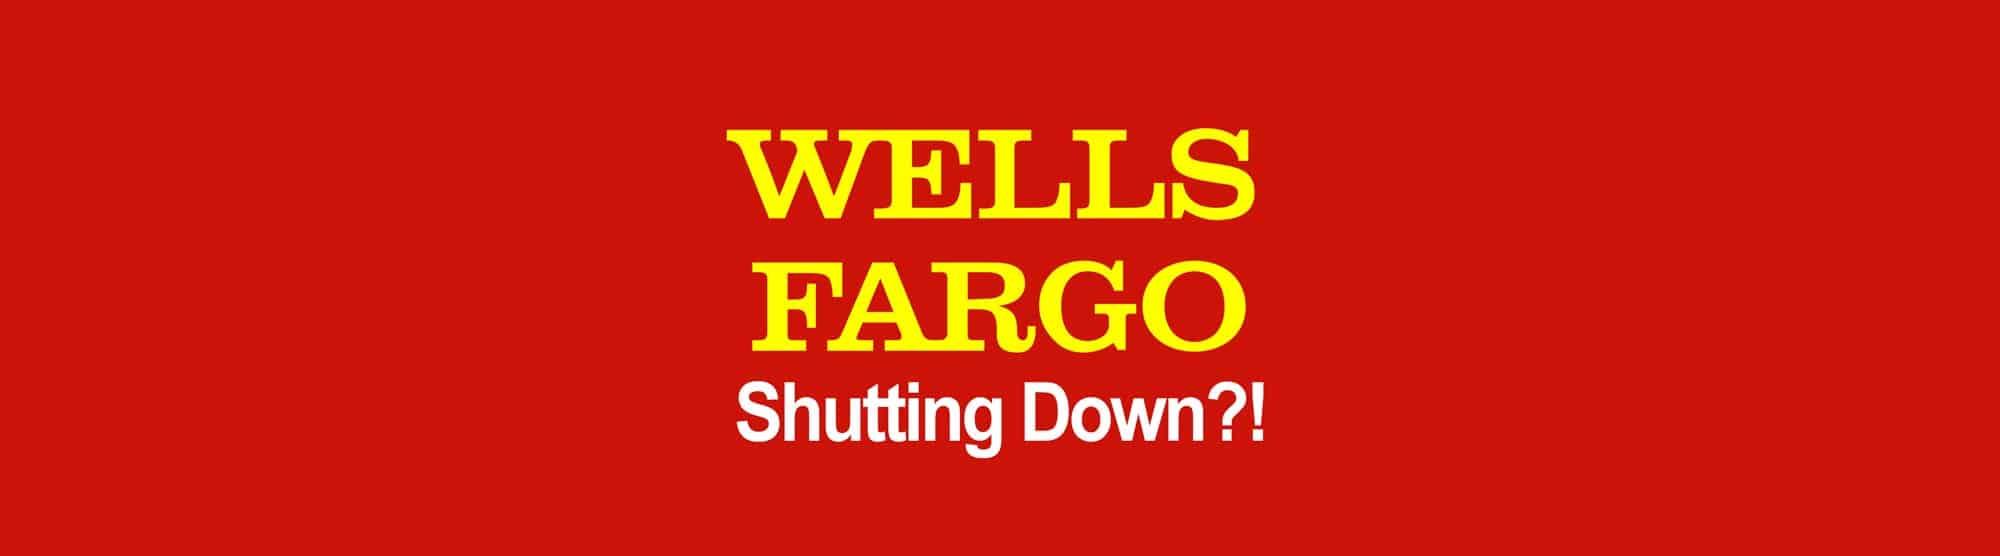 Wells fargo scandal shutdown